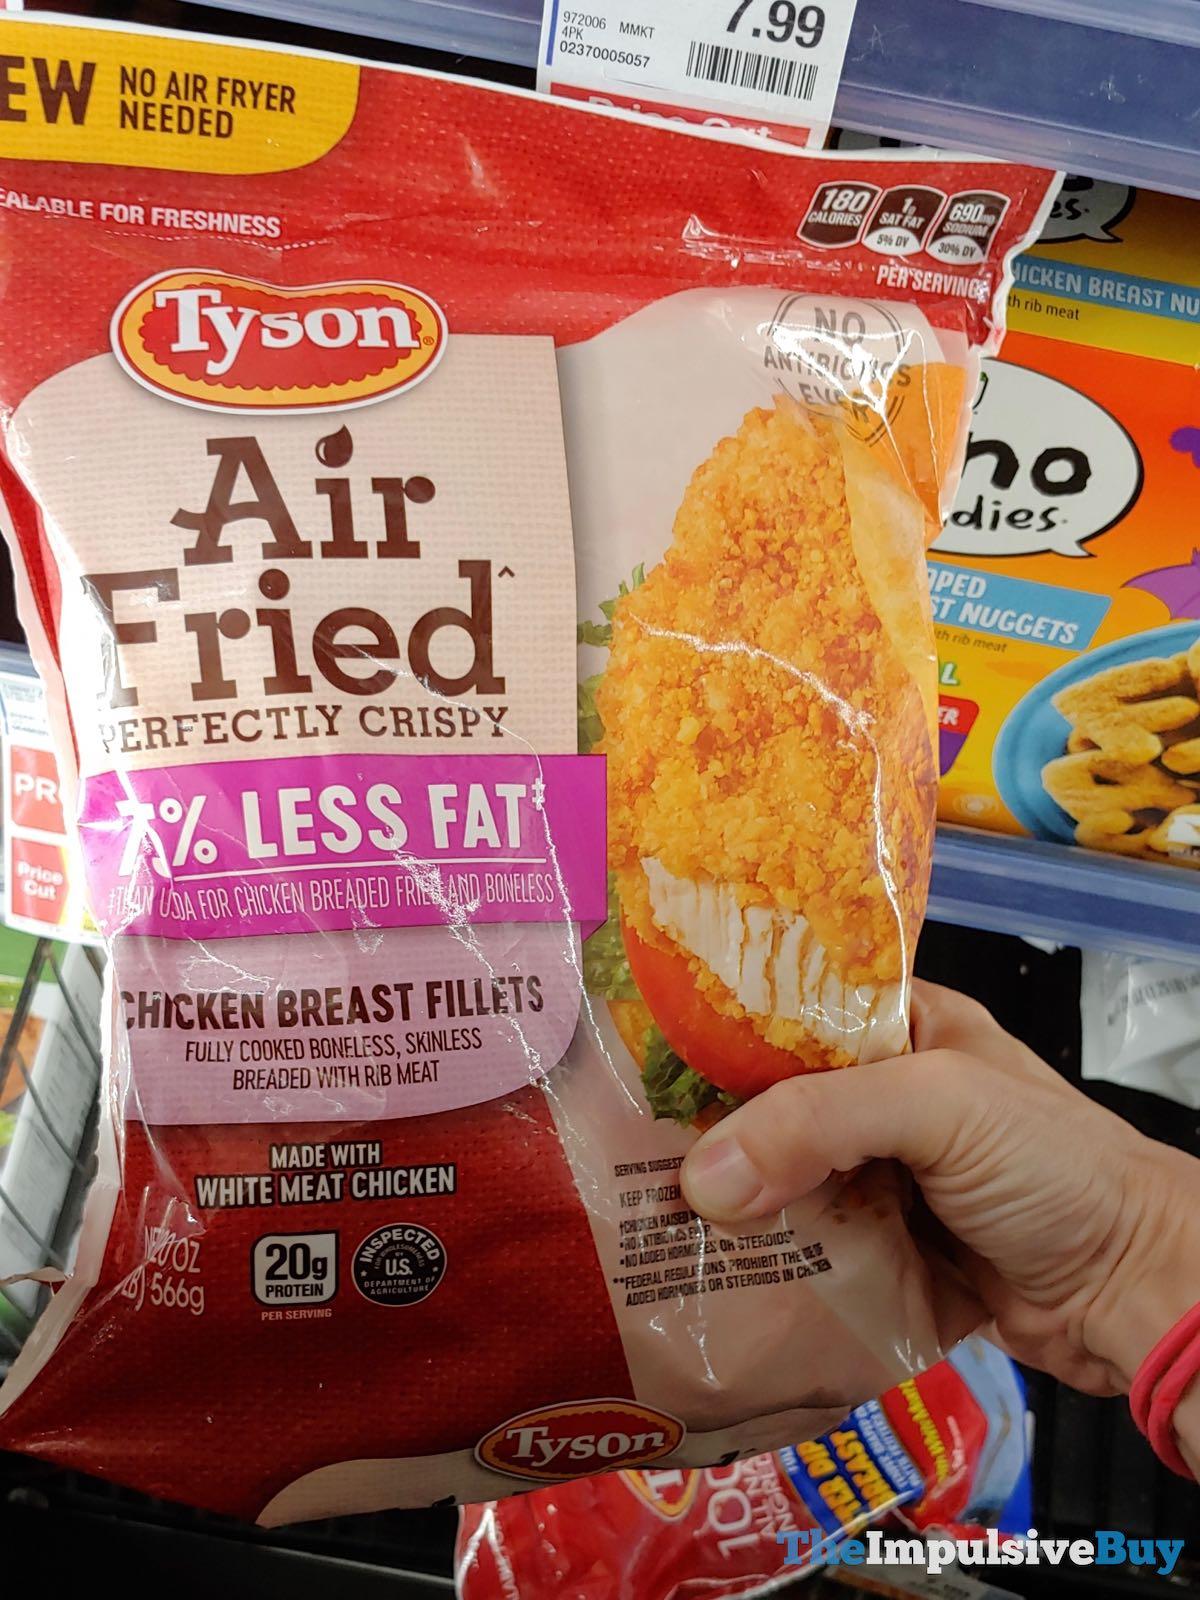 Tyson Air Fried Chicken Breast Fillets Jpg The Impulsive Buy